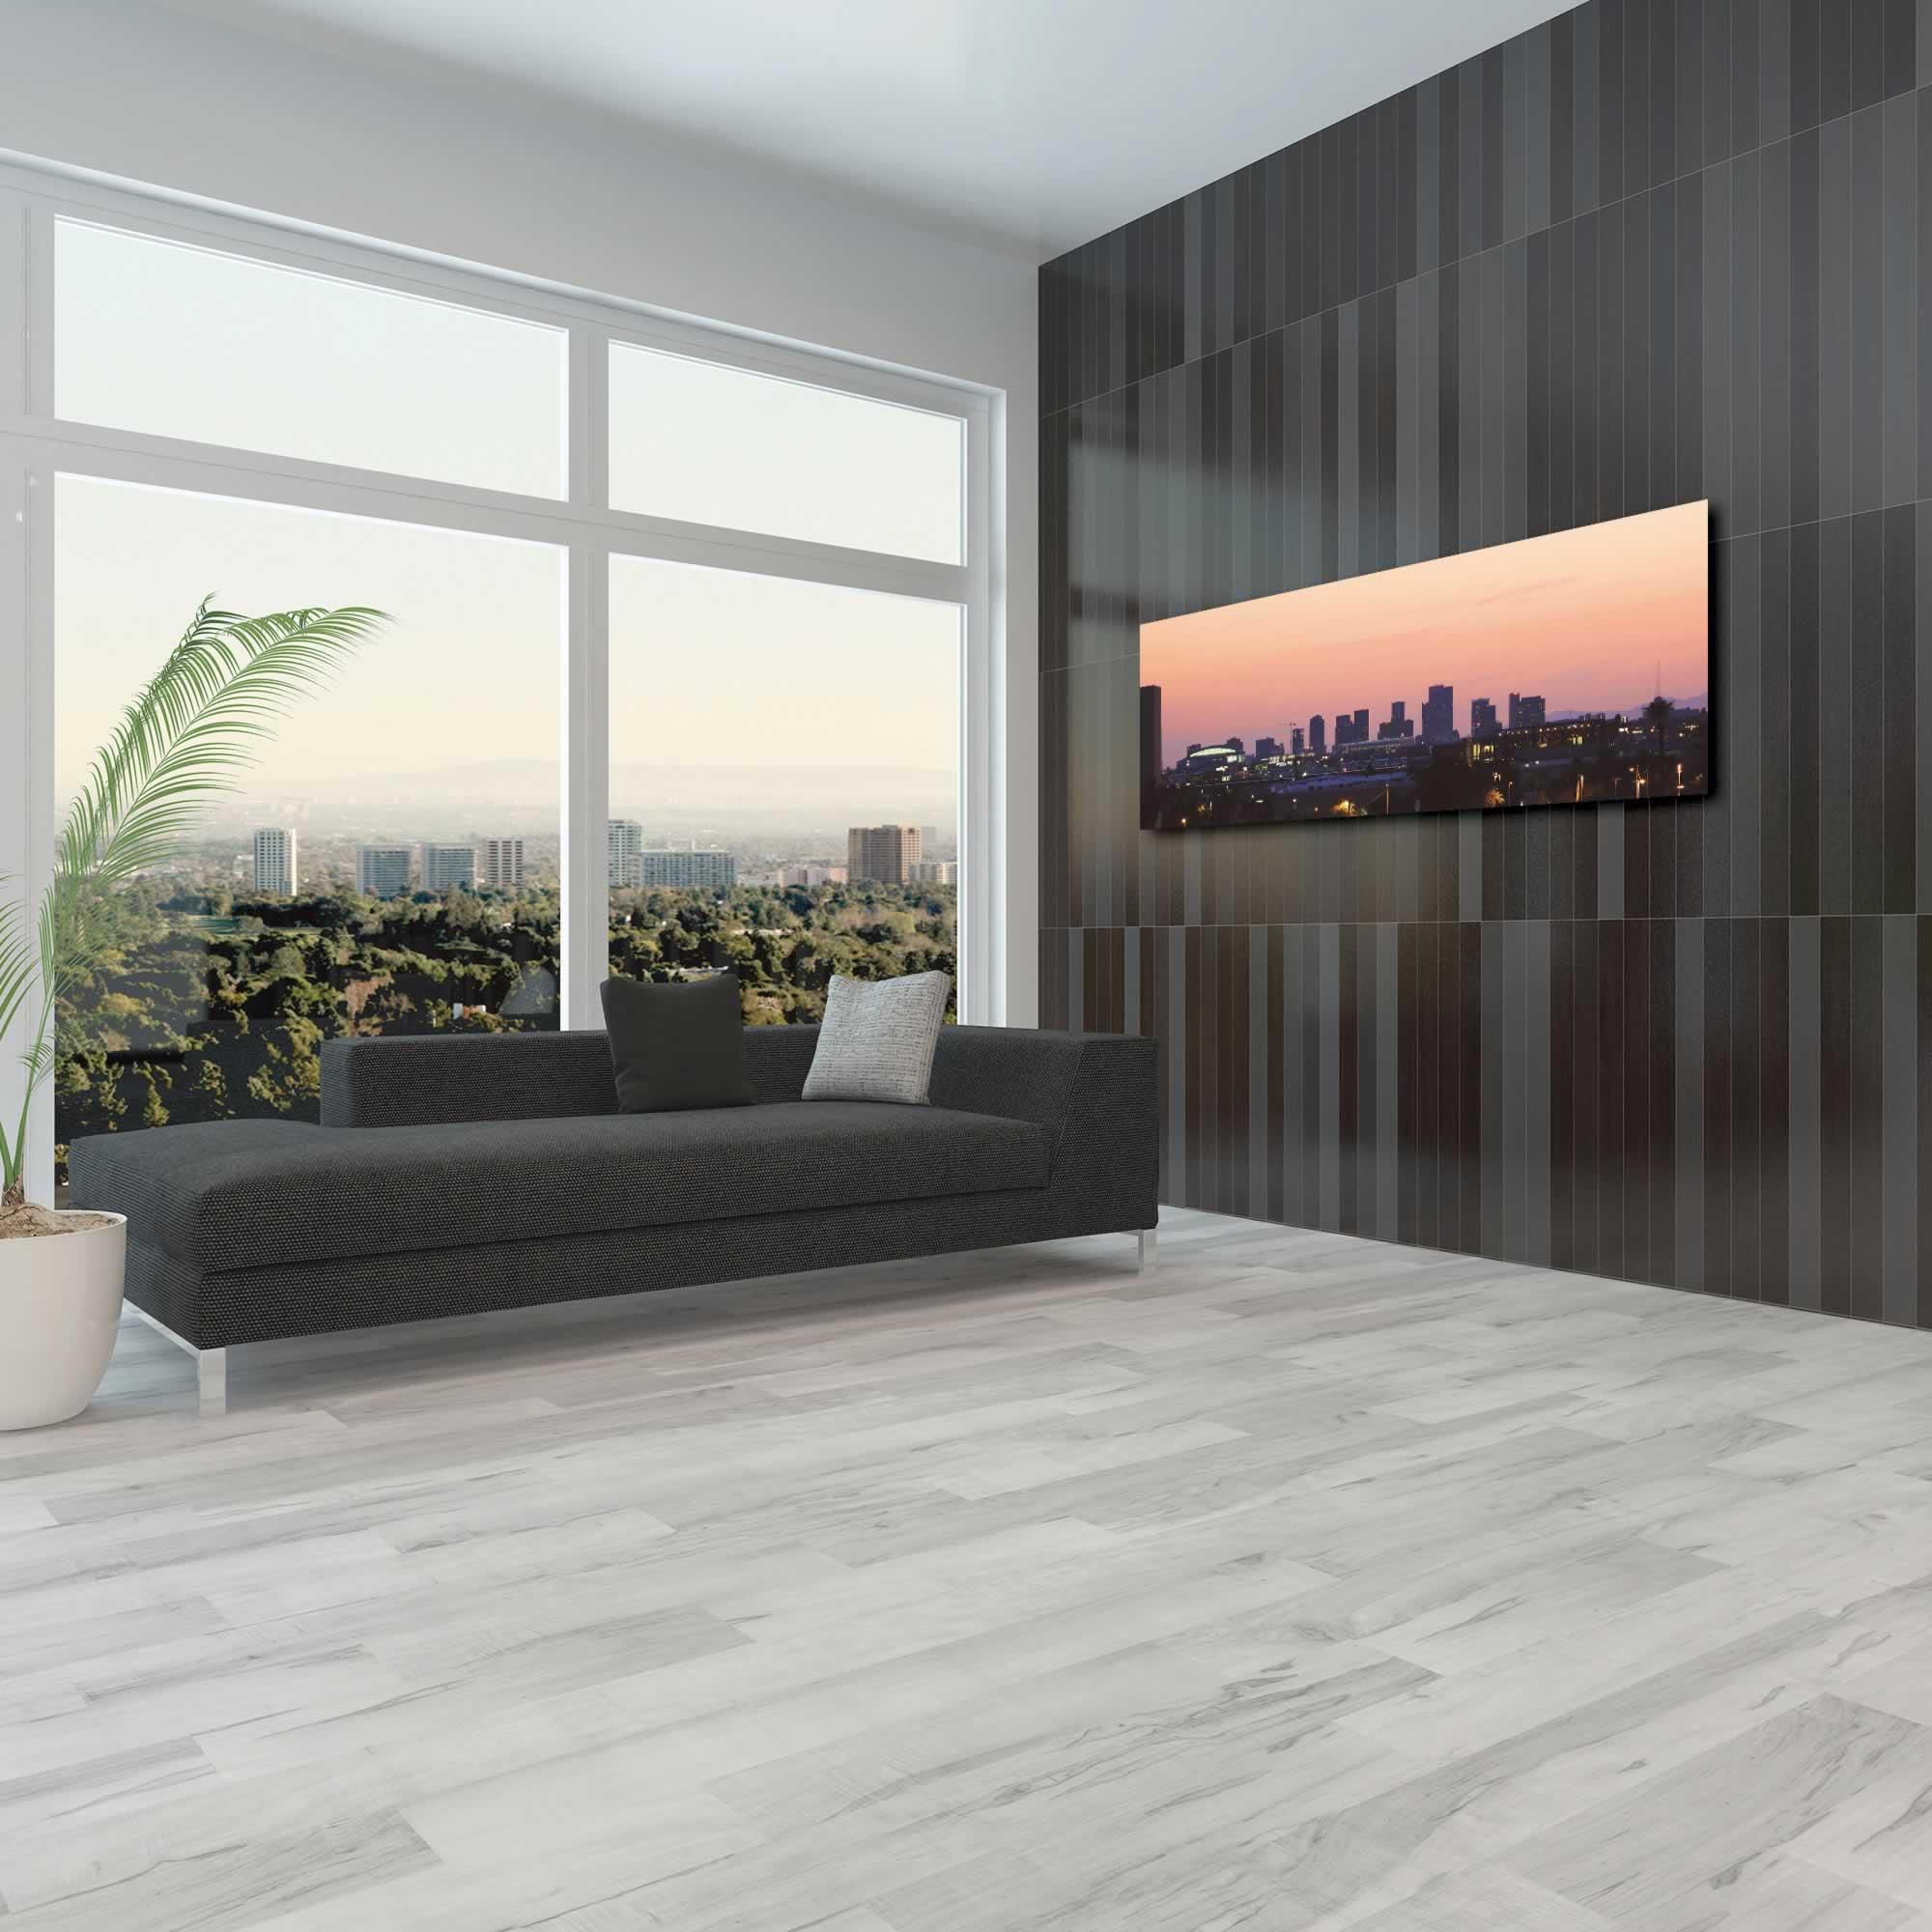 Phoenix City Skyline - Urban Modern Art, Designer Home Decor, Cityscape Wall Artwork, Trendy Contemporary Art - Alternate View 3